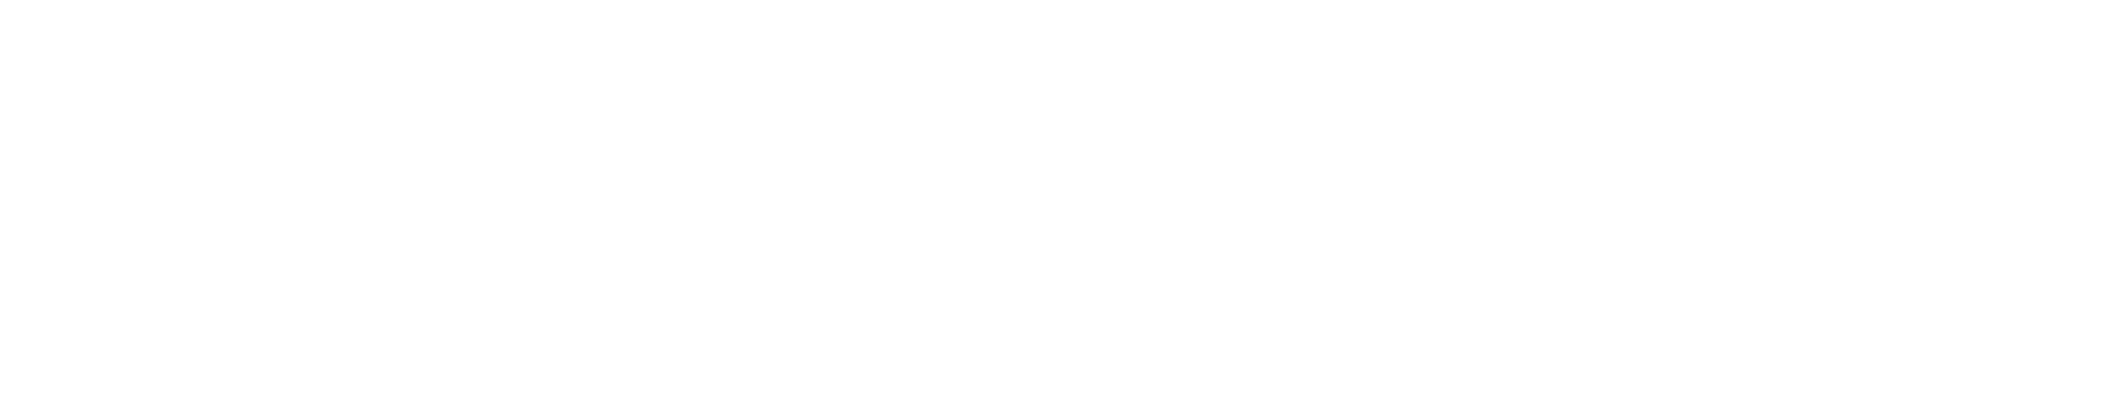 intervention-sur-site-icone